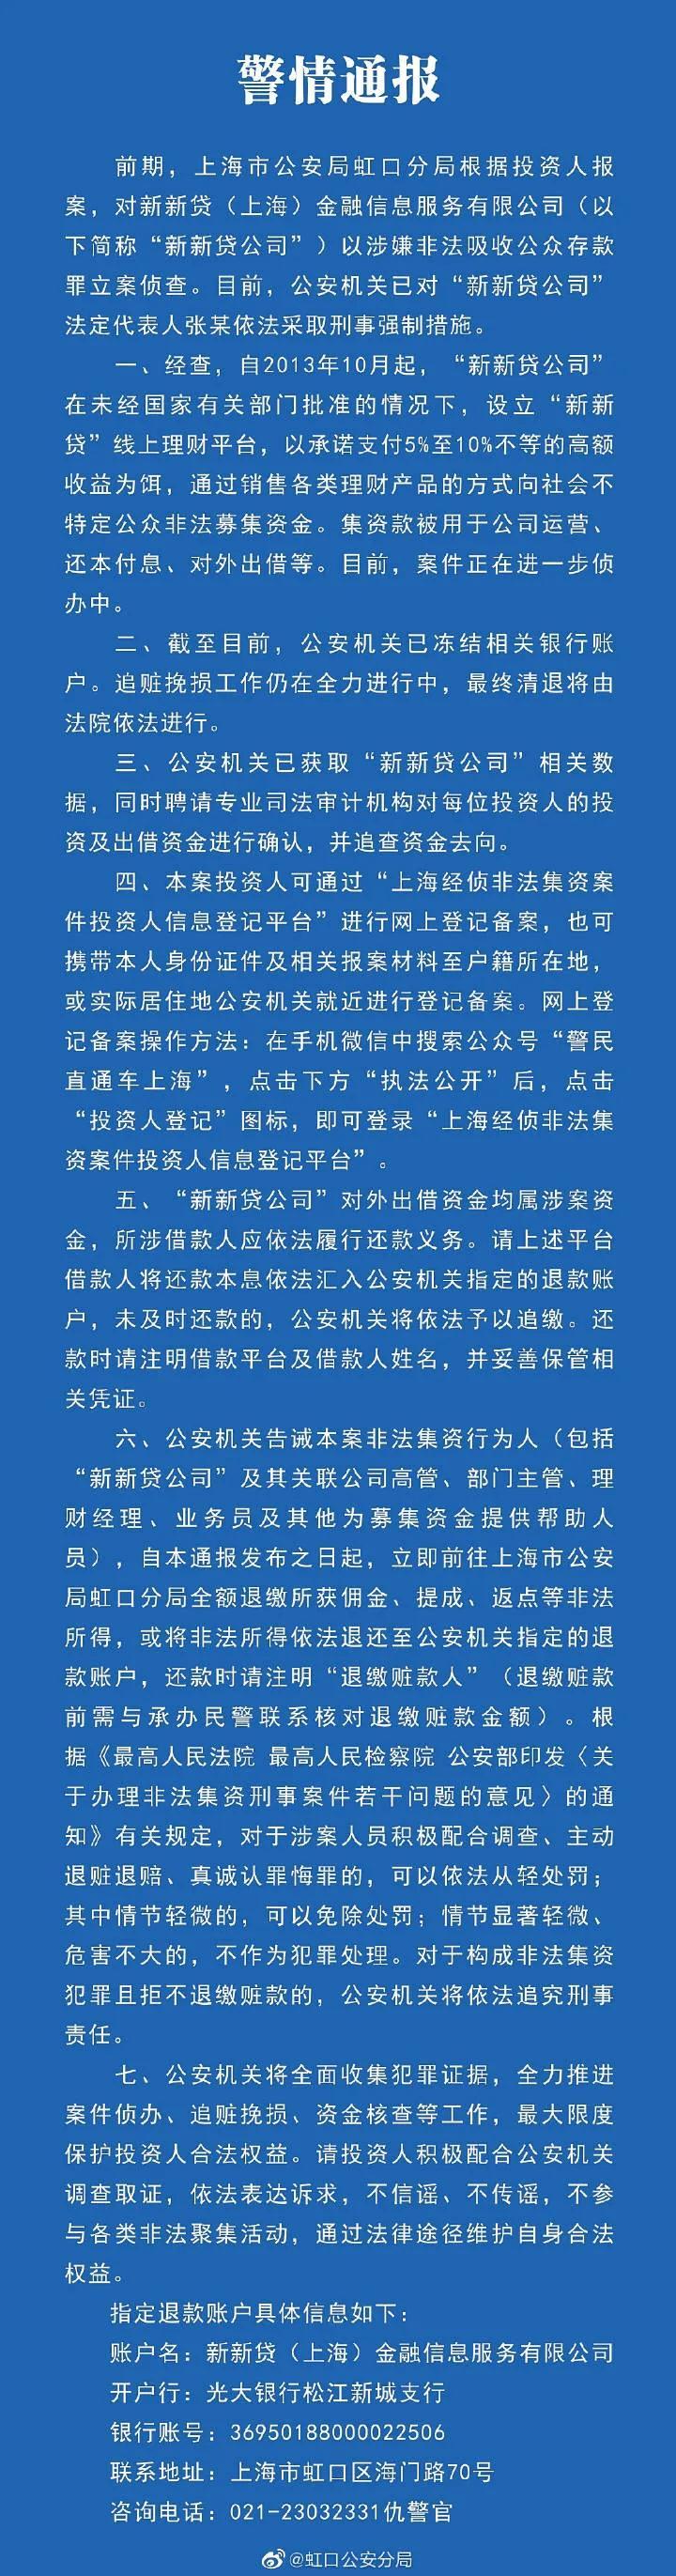 usdt无需实名买入卖出(caibao.it):又一家P2P被立案!法人被接纳刑事强制措施出借人可报案